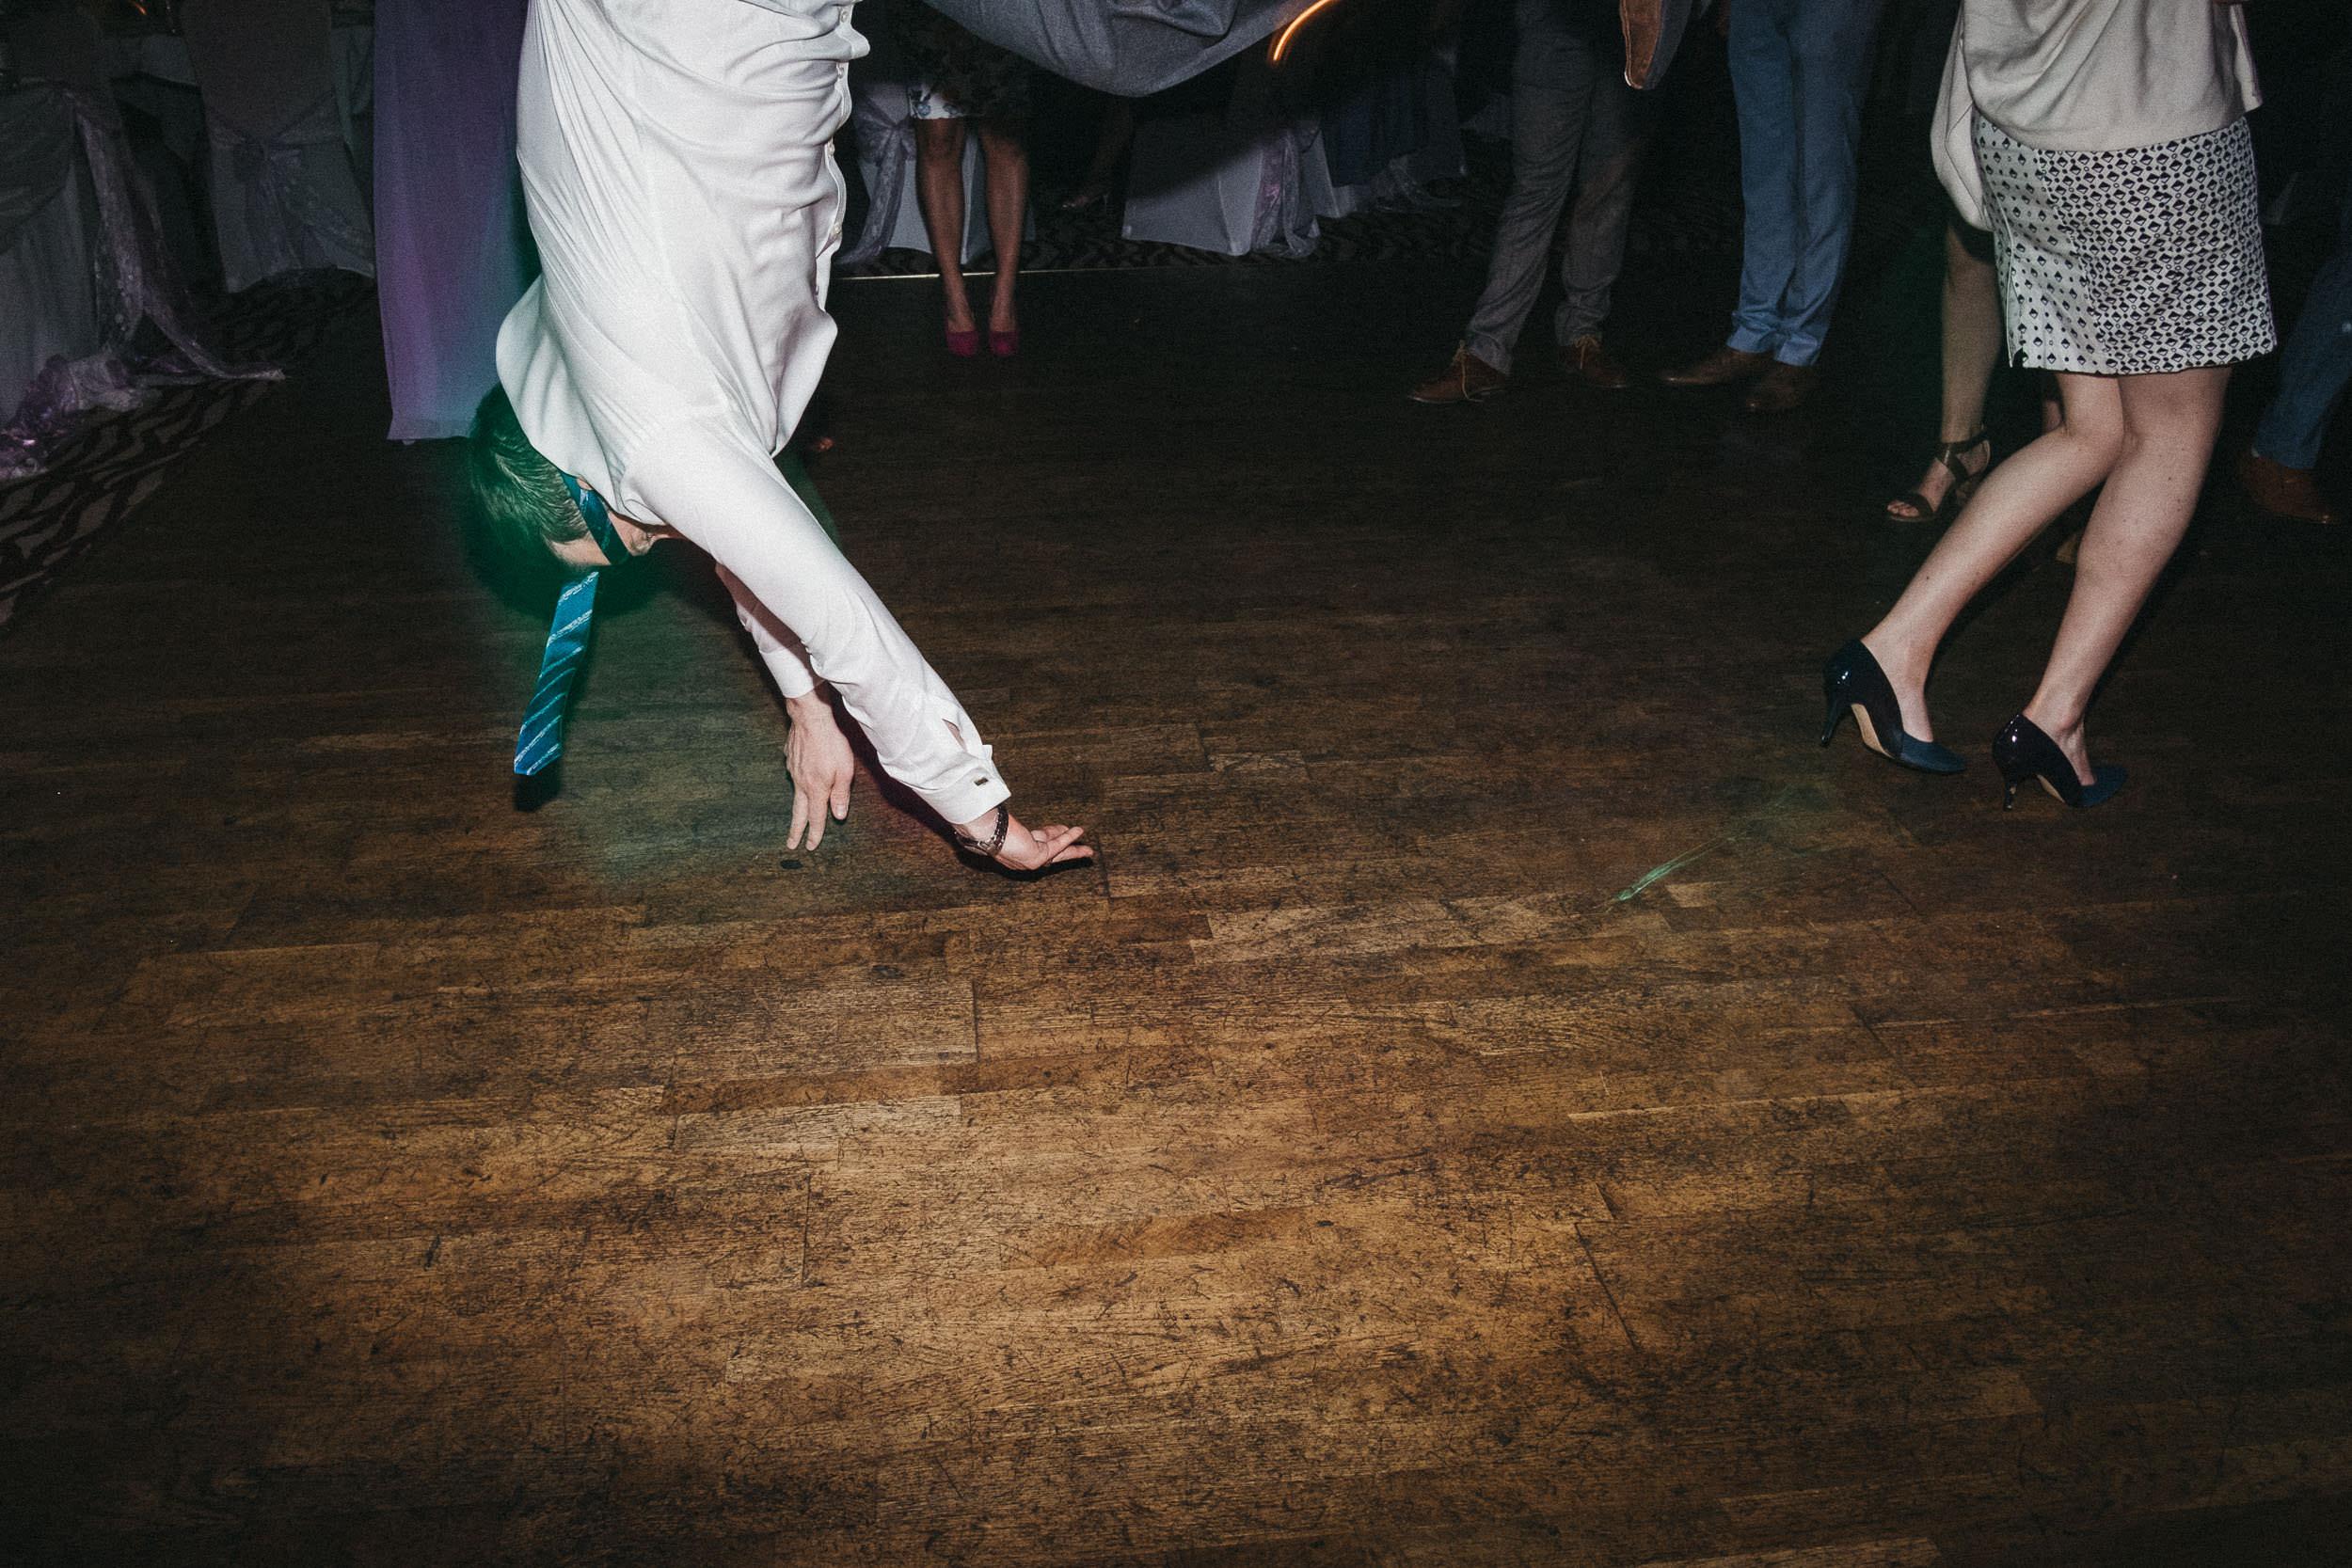 Groomsman somersaulting through air on wedding dance floor